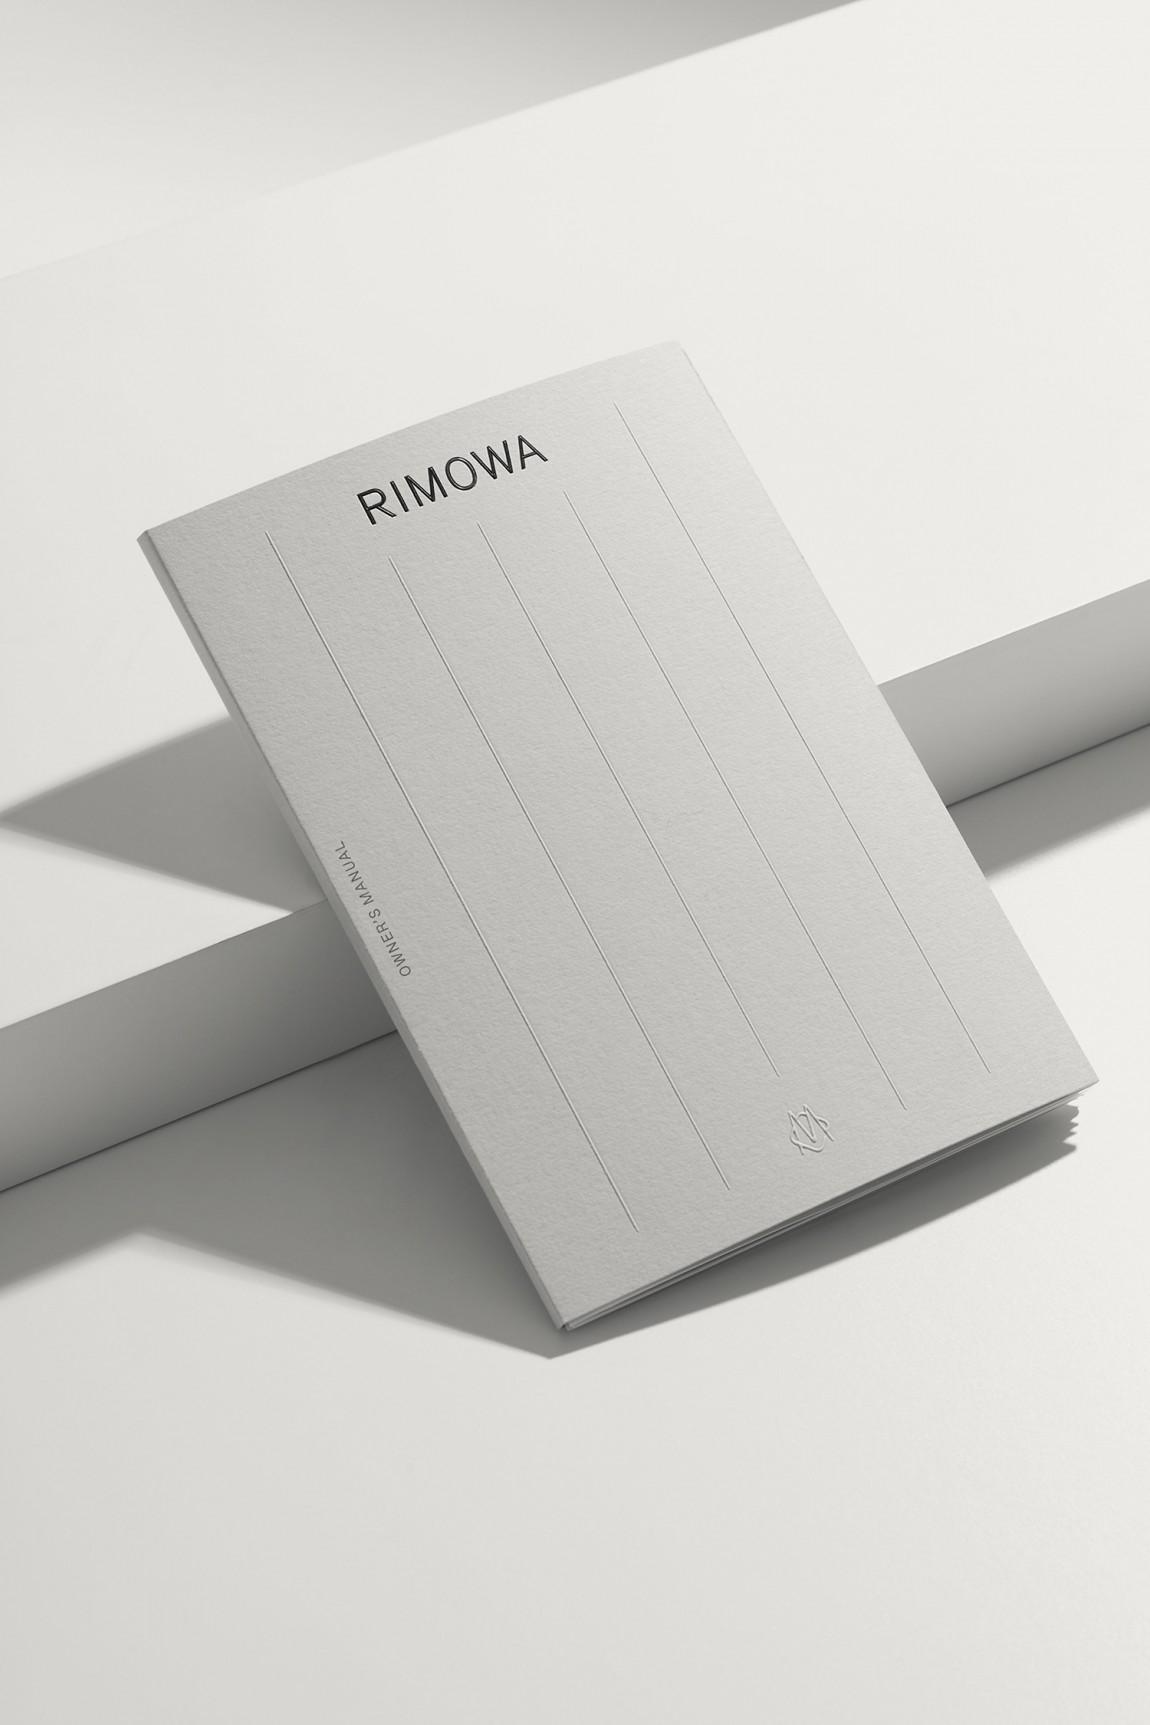 Rimowa豪华箱包国际品牌VI设计, 画册设计